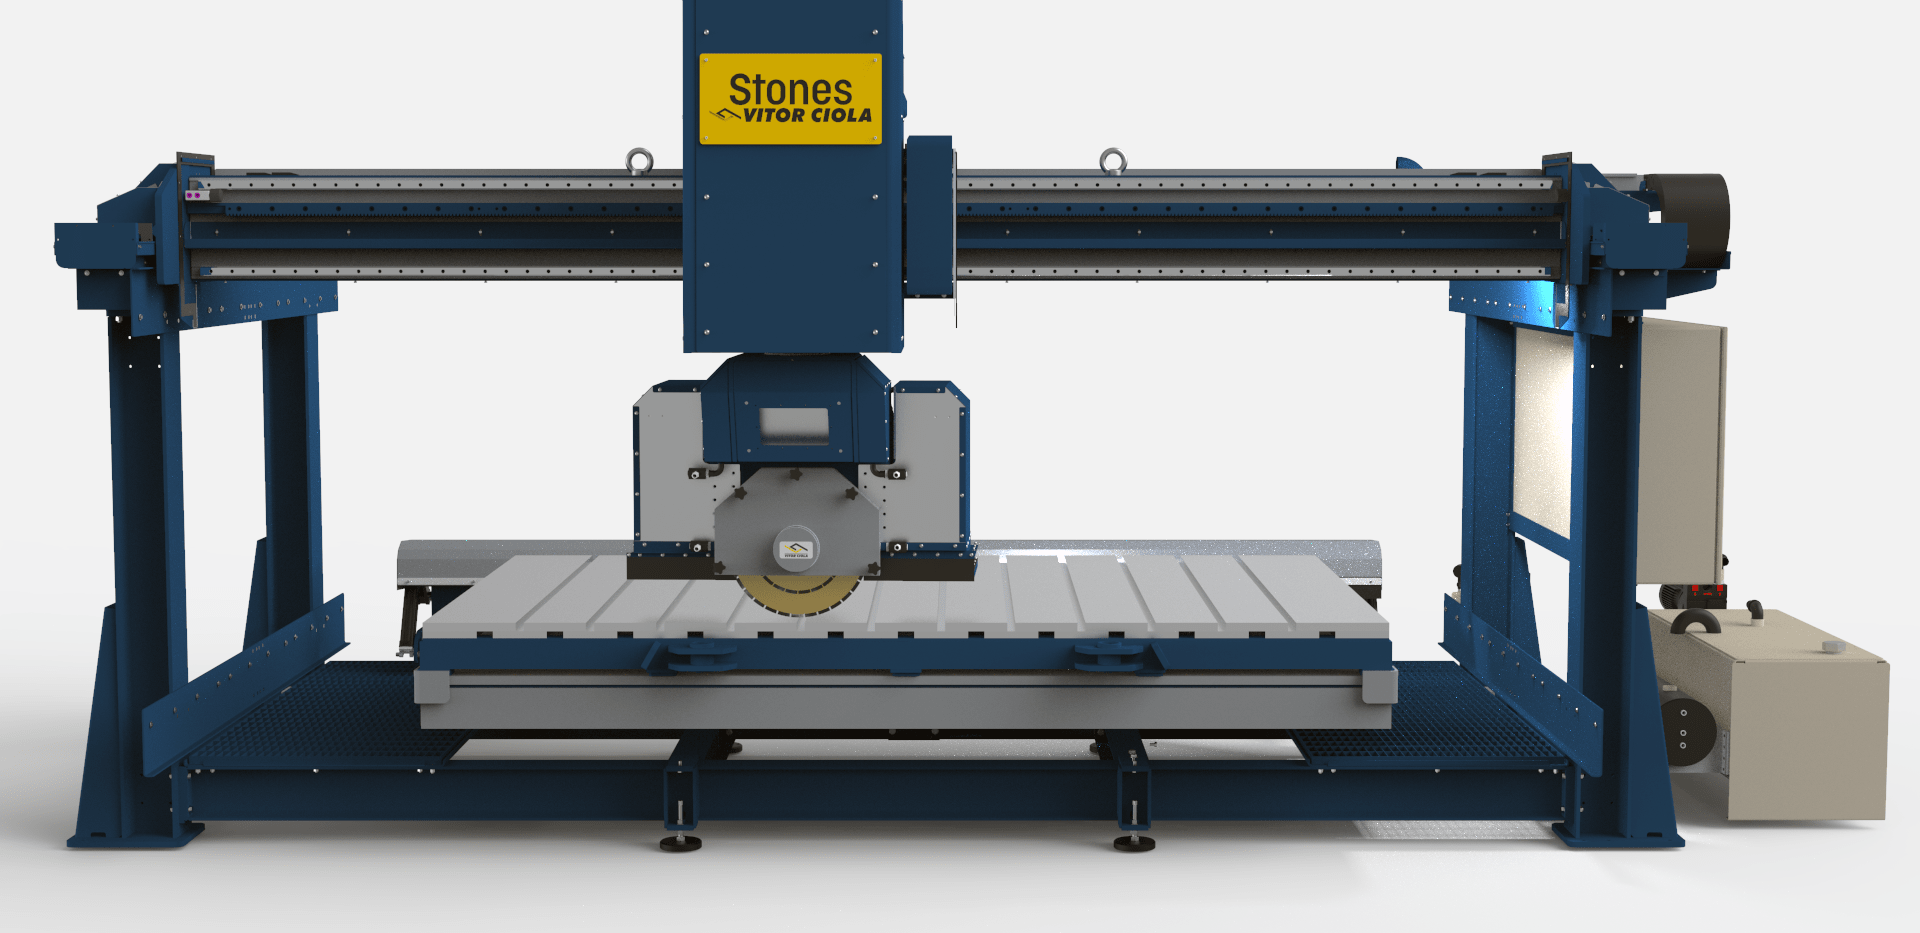 Fresadora CNC | Stones